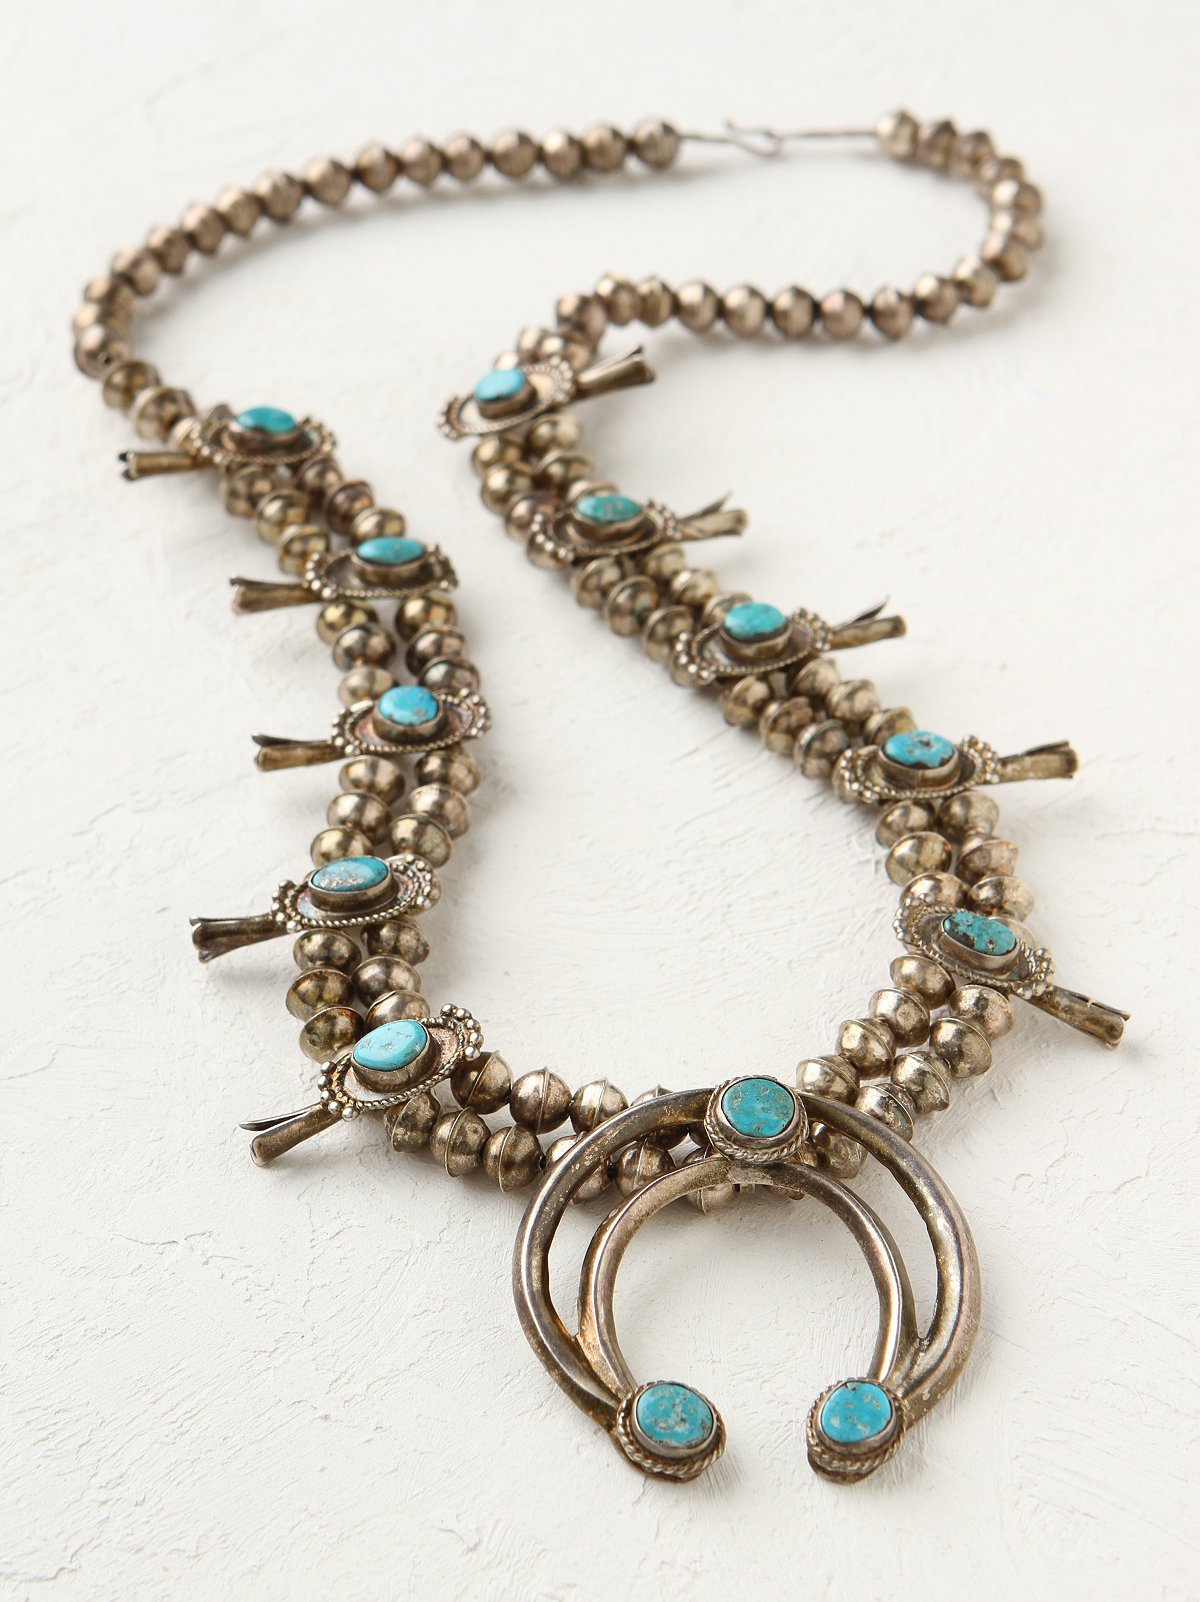 Vintage Squash Blossom Turquoise Necklace